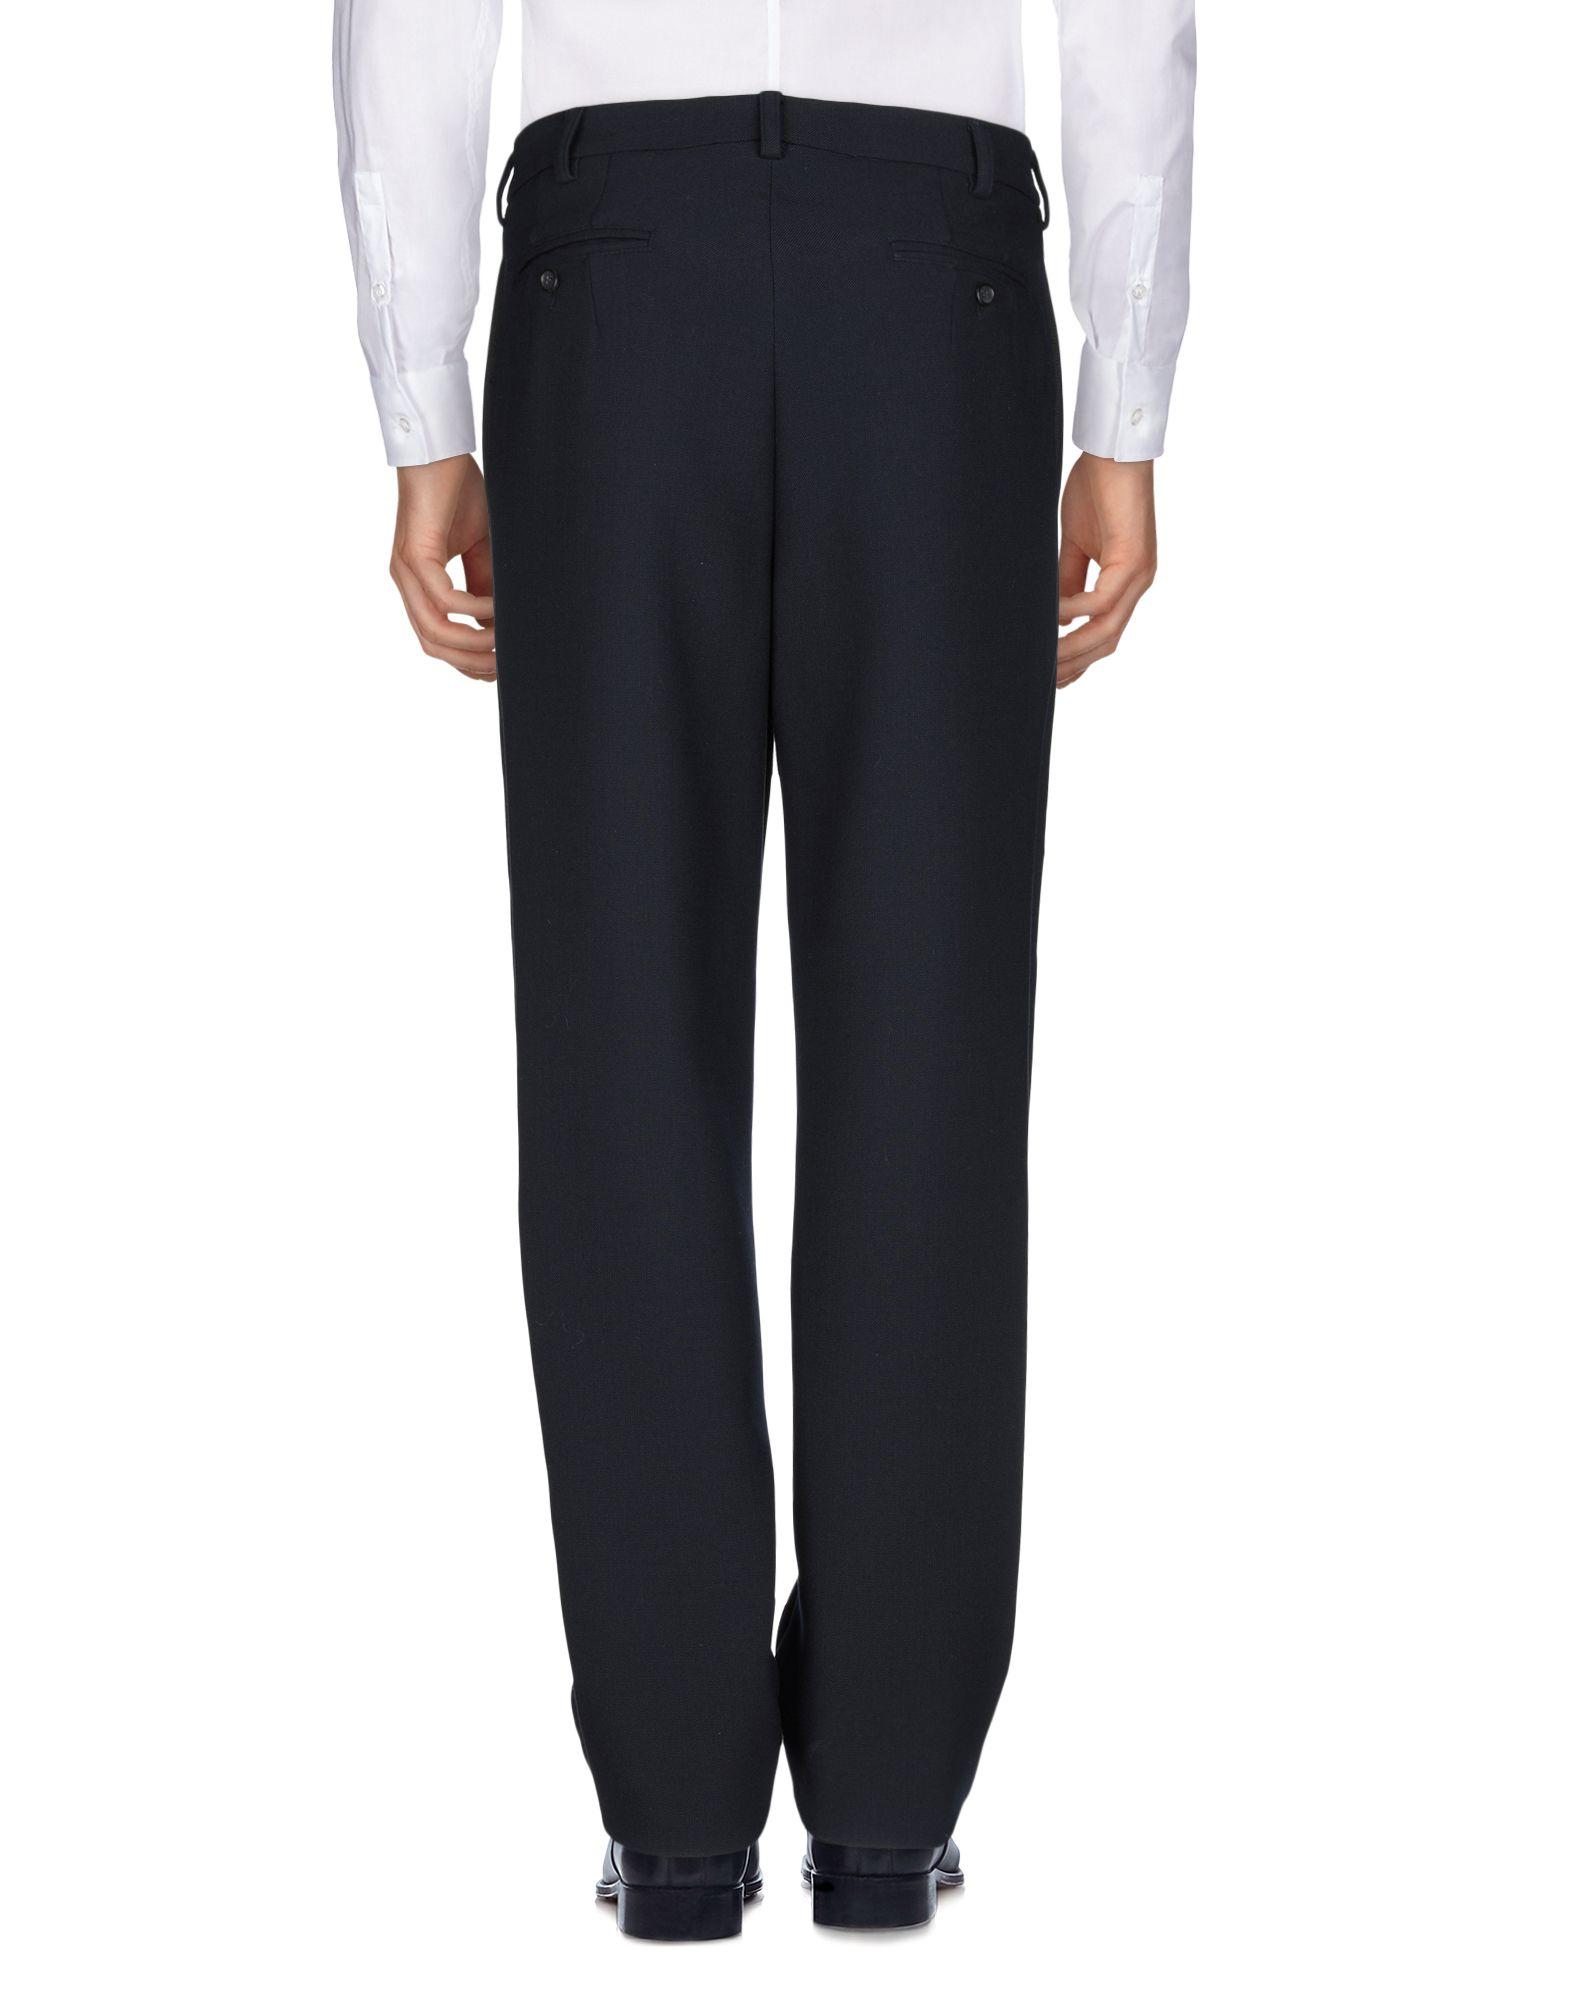 Pantalone Société Anonyme Uomo - - - 13208814JK c0fbbf